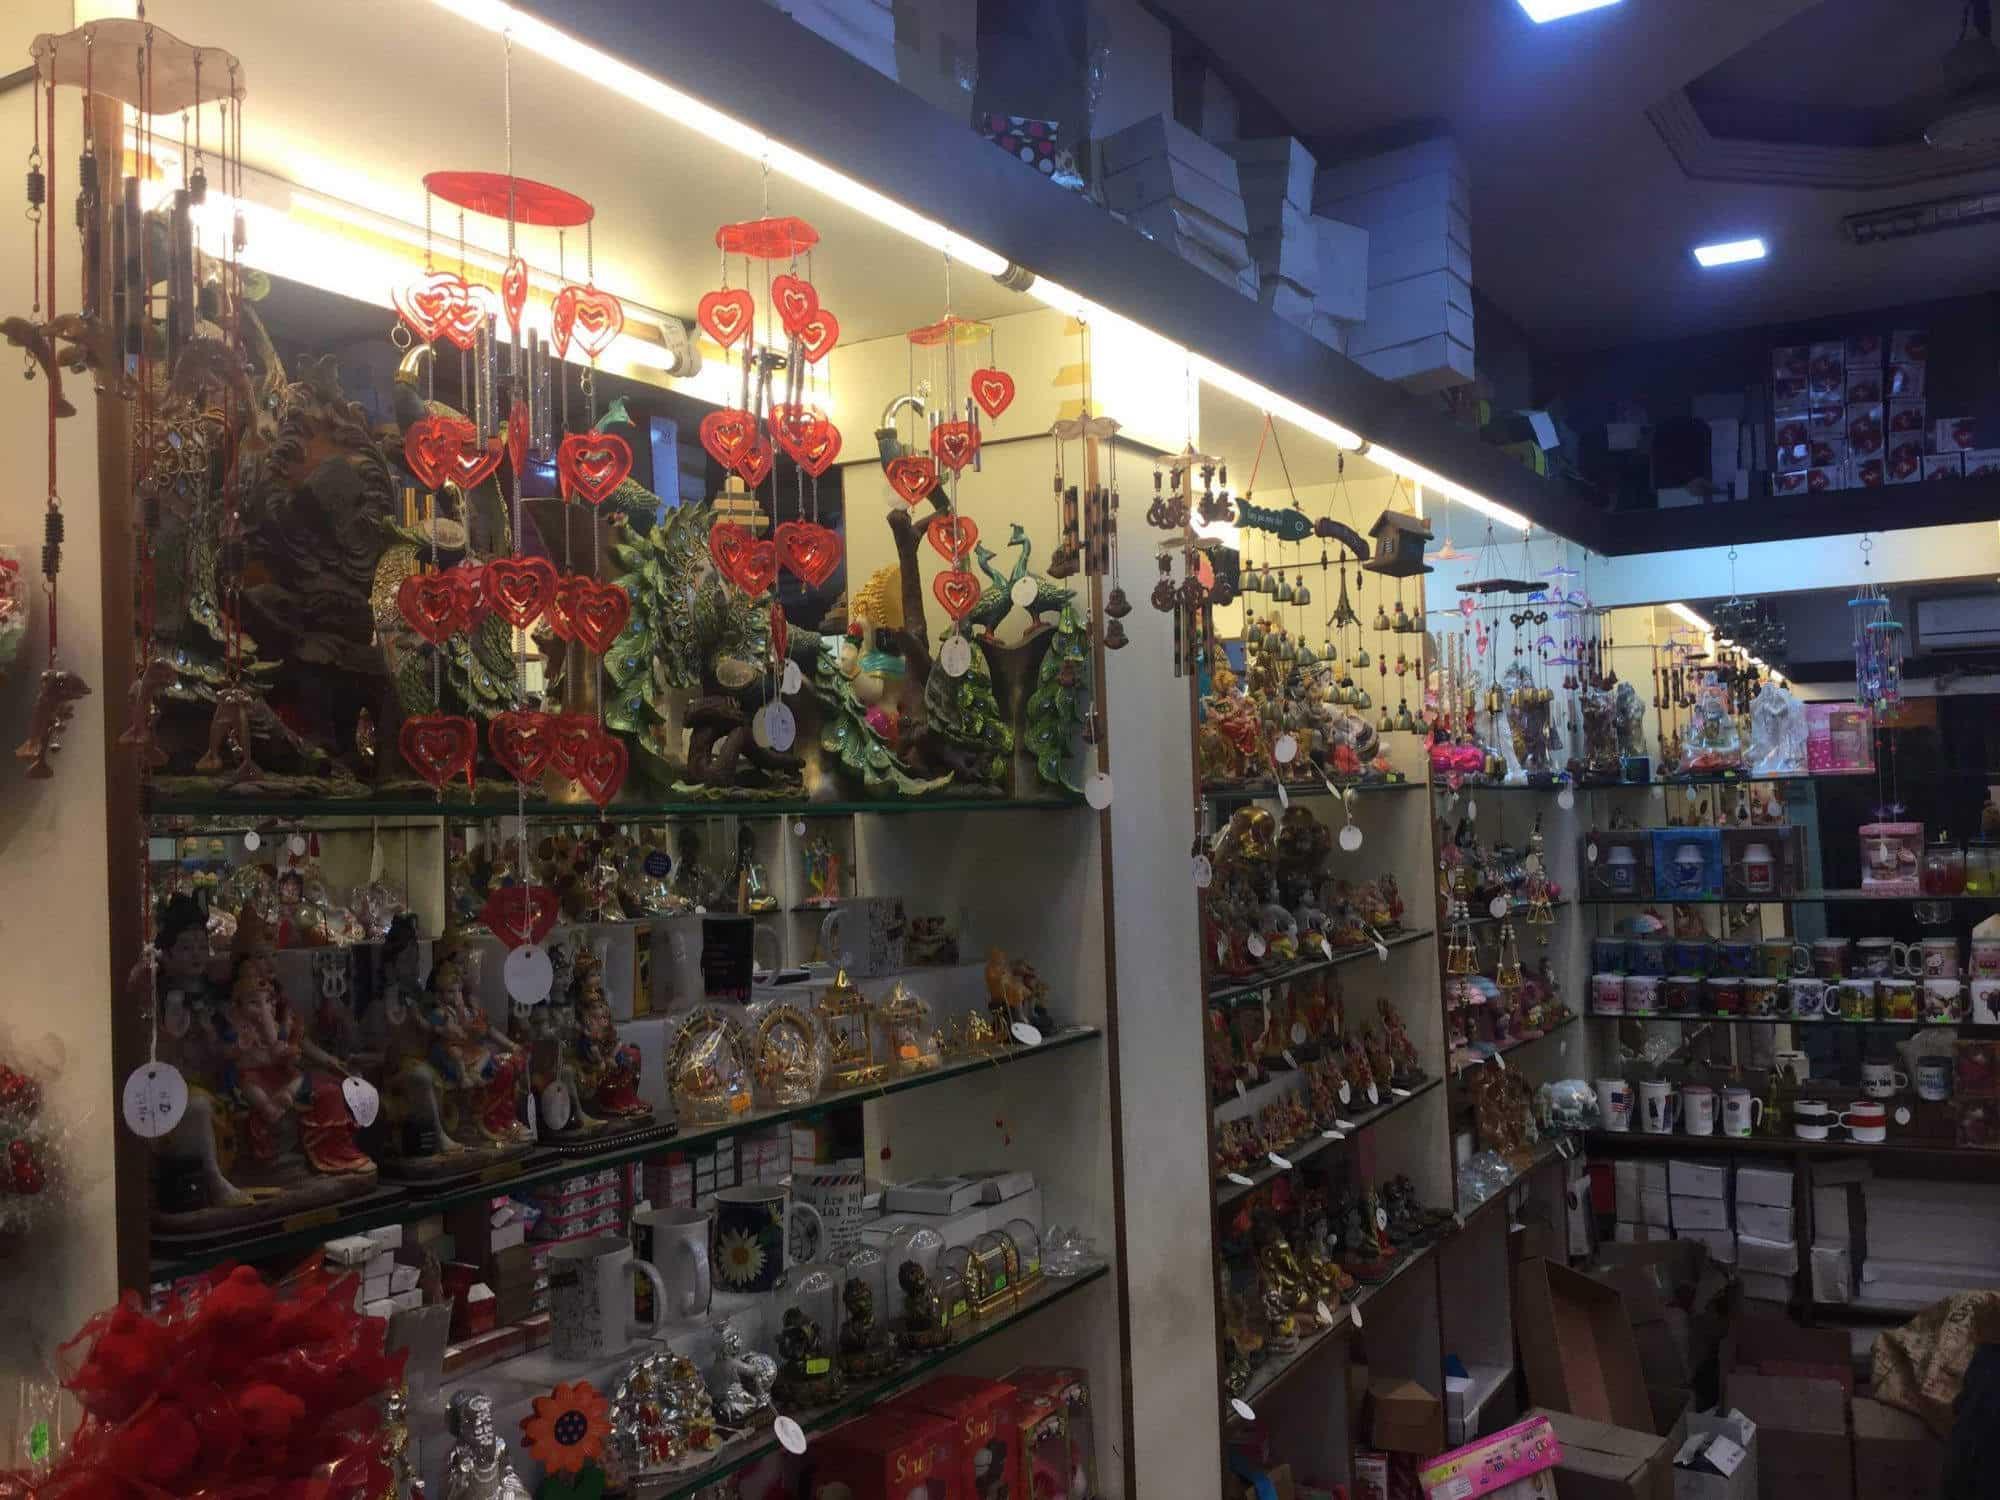 Tohfa Collection, Sadar Bazar - Gift Shops in Delhi - Justdial